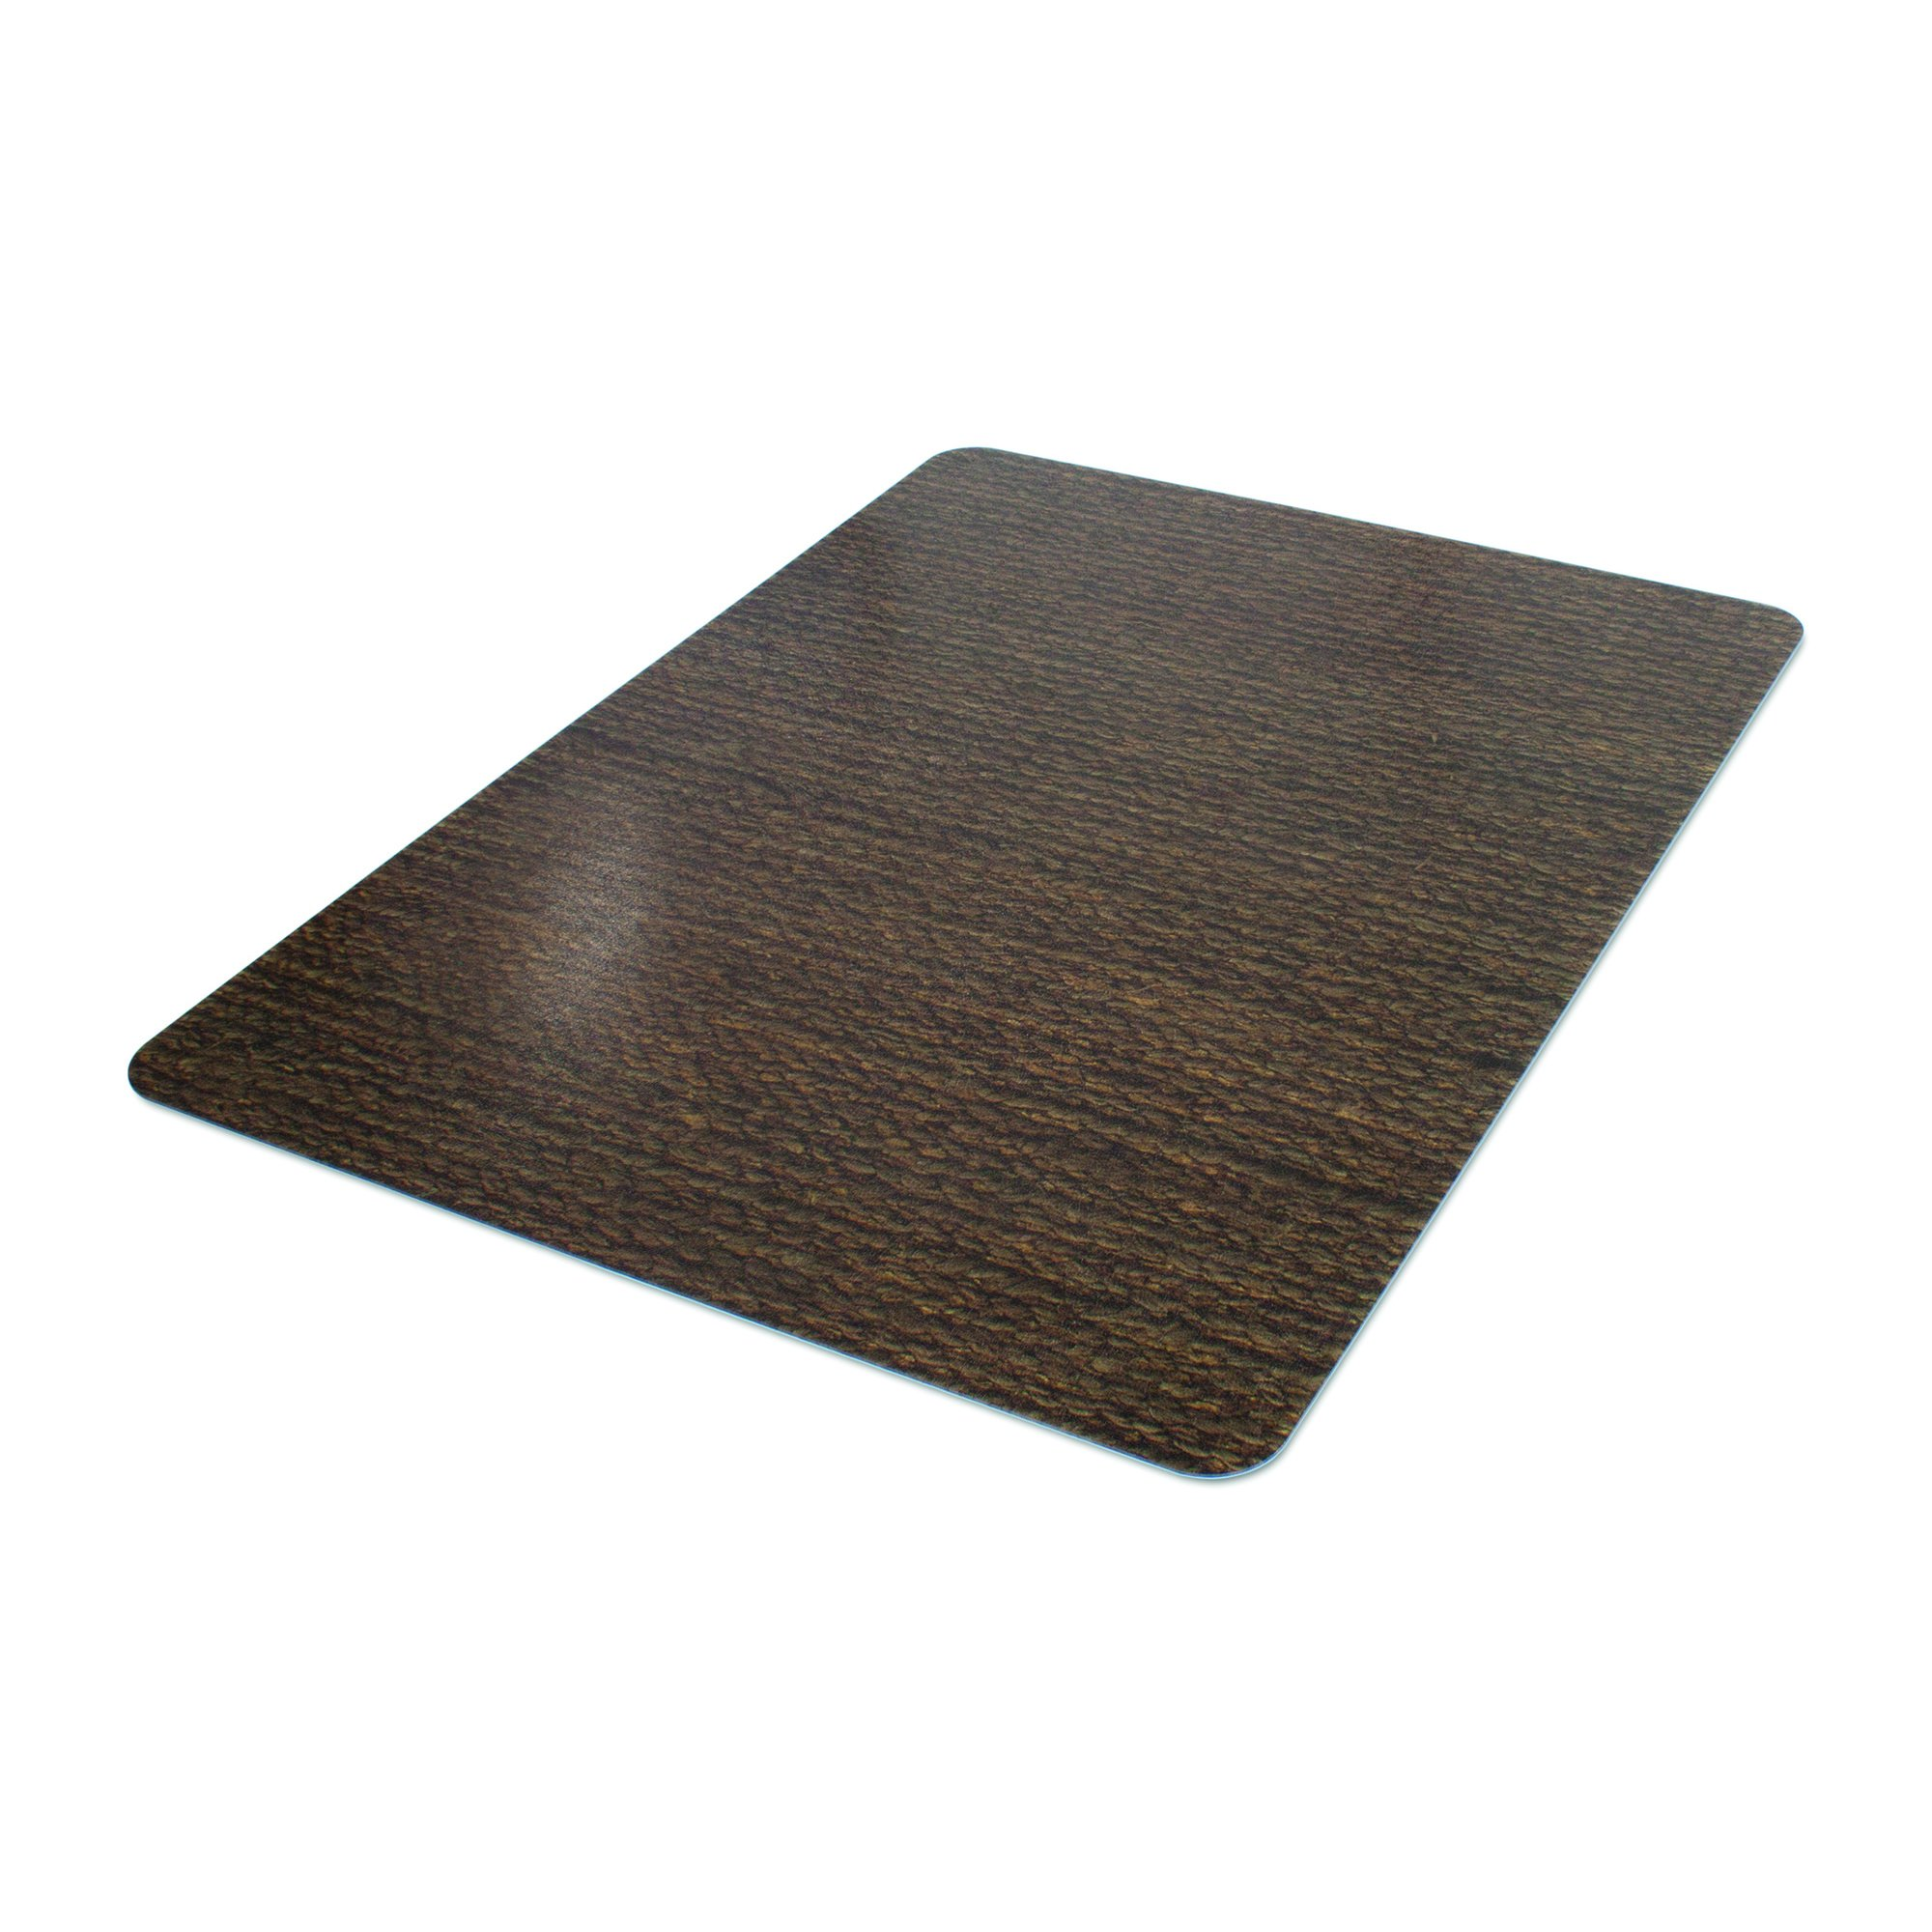 Deflecto DuraMat Decorative Chair Mat, Hard Floor Use, Rectangle, Straight Edge, 36 x 48 Inches, Chenille Jute Print (CM23142HCJ)